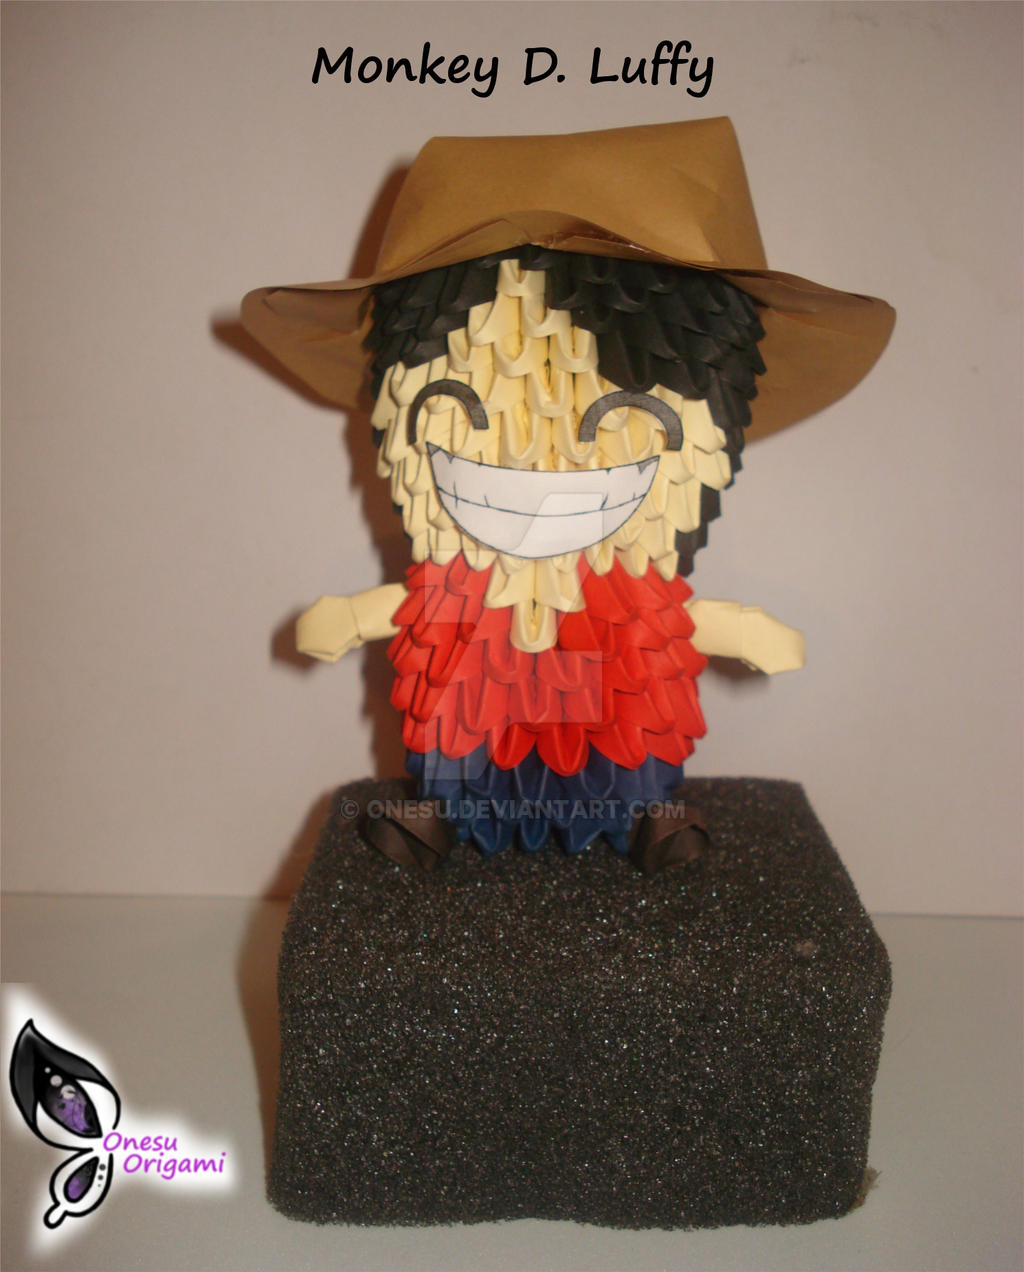 Monkey D Luffy By Onesu